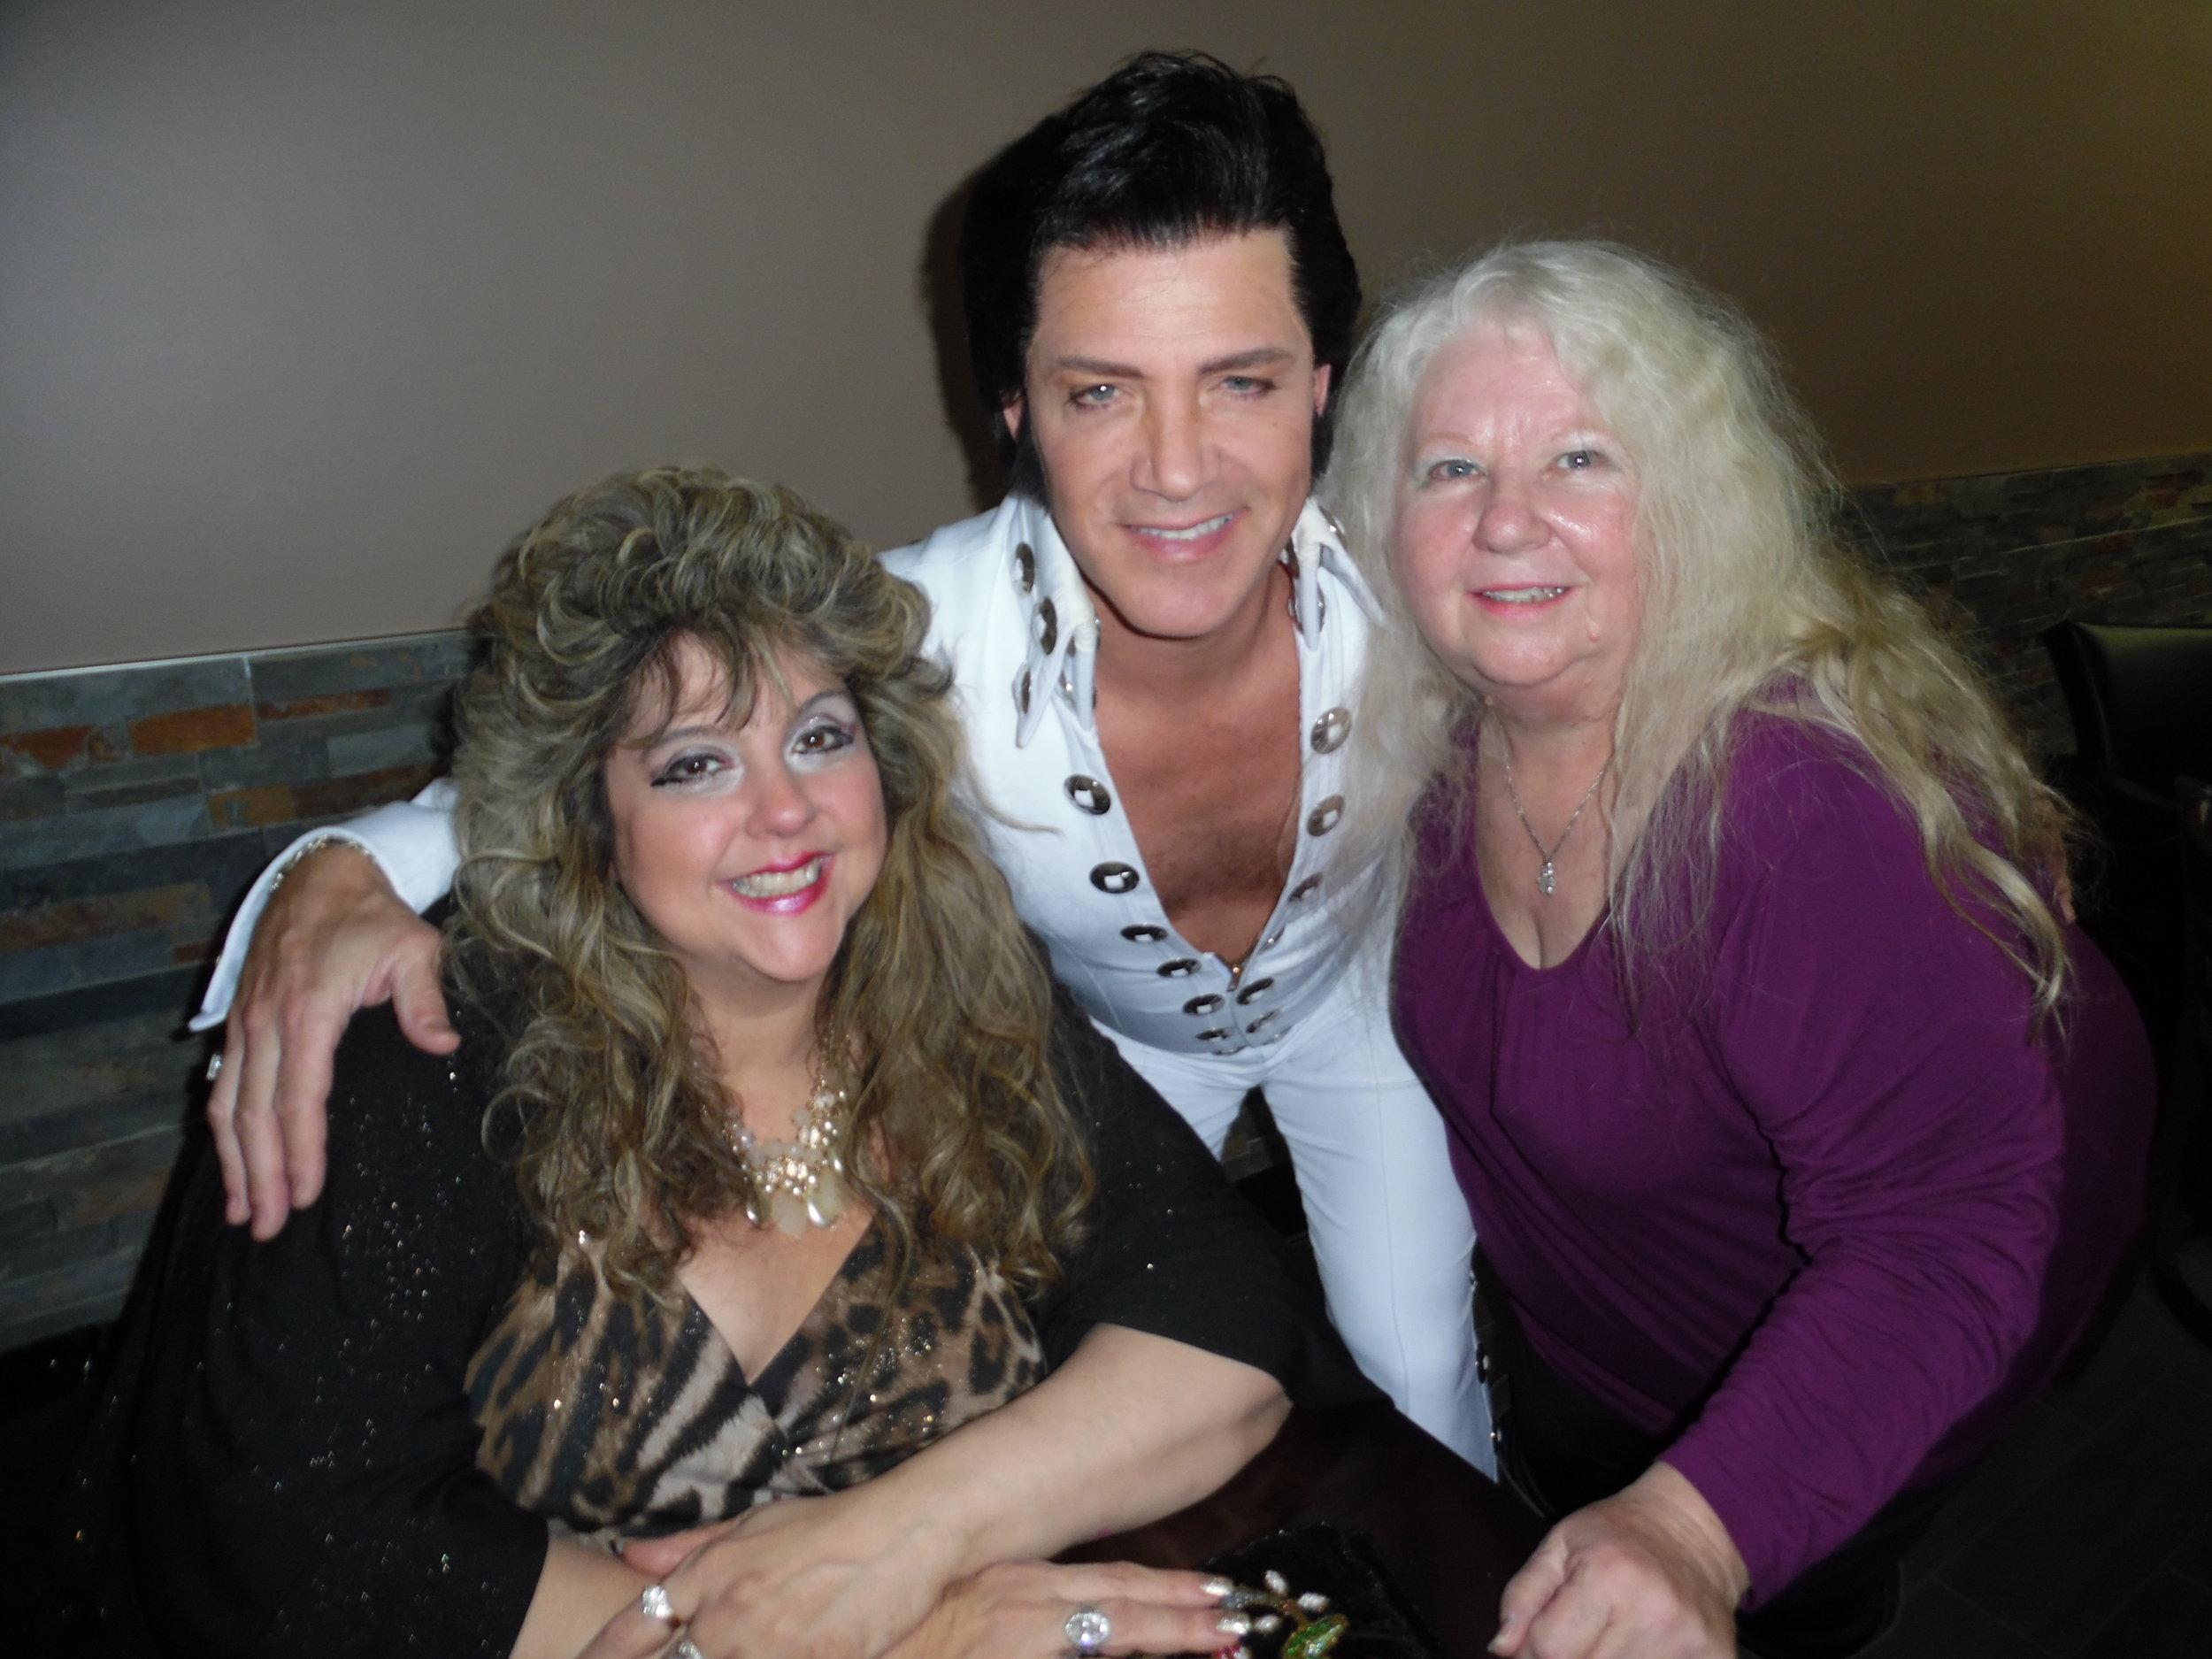 Sandra Gold, ETA  Kevin Mills , and Dot Farr at Flamboro Downs, December 15th, 2017.